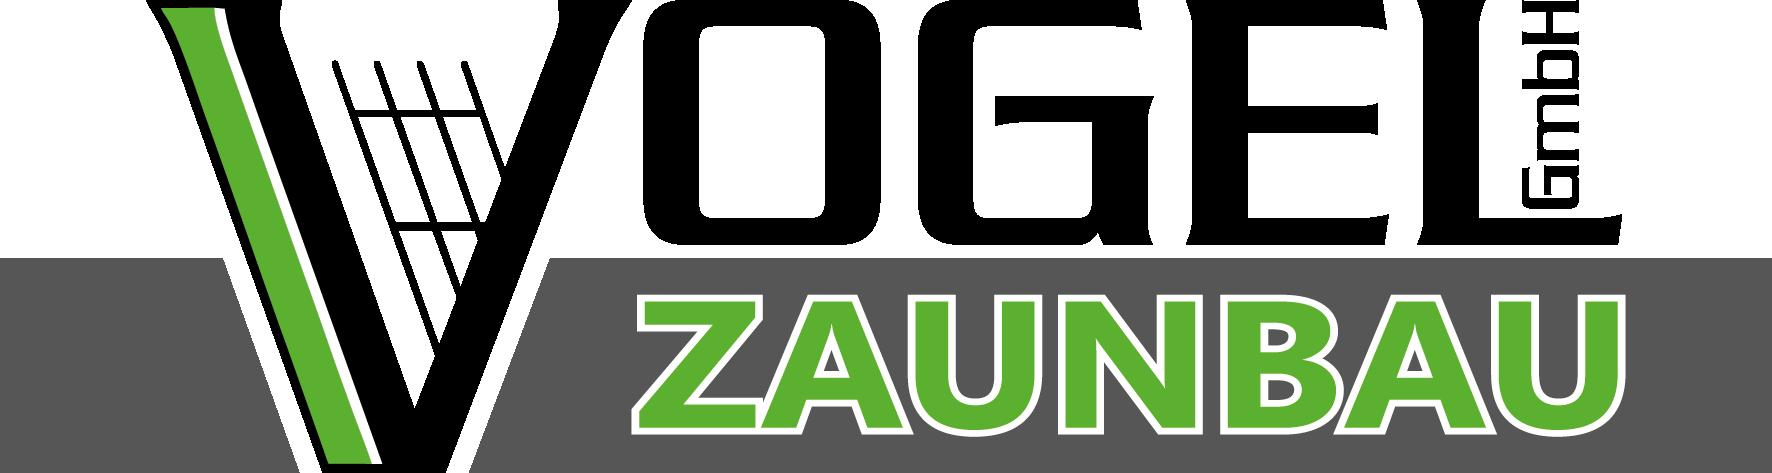 Vogel Zaunbau GmbH